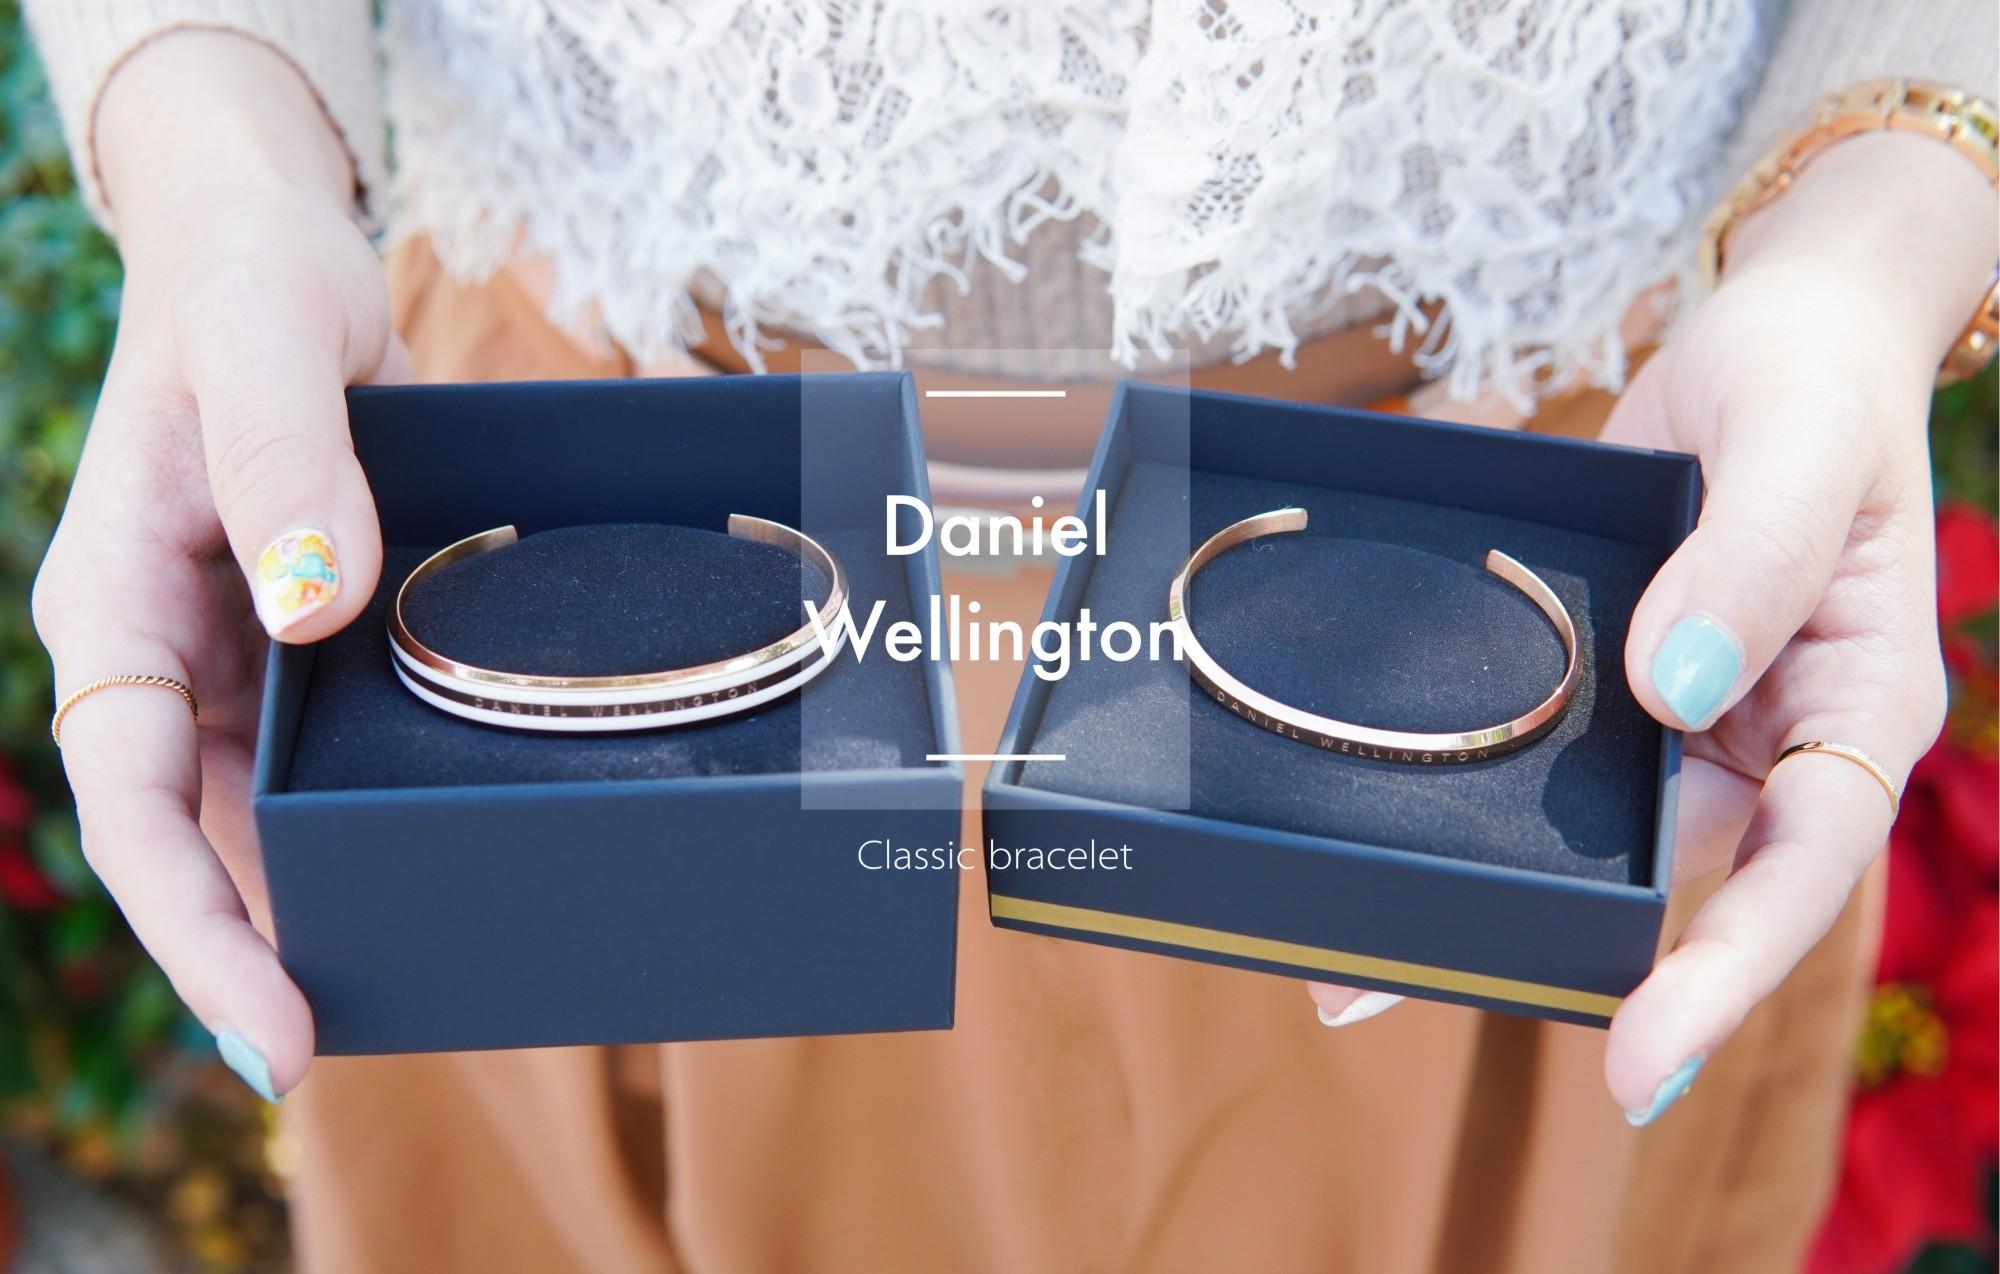 ☆【DW折扣碼】Daniel Wellington 手環收藏+層次搭配小技巧。2020折扣碼:kaikai00603 @凱的日本食尚日記